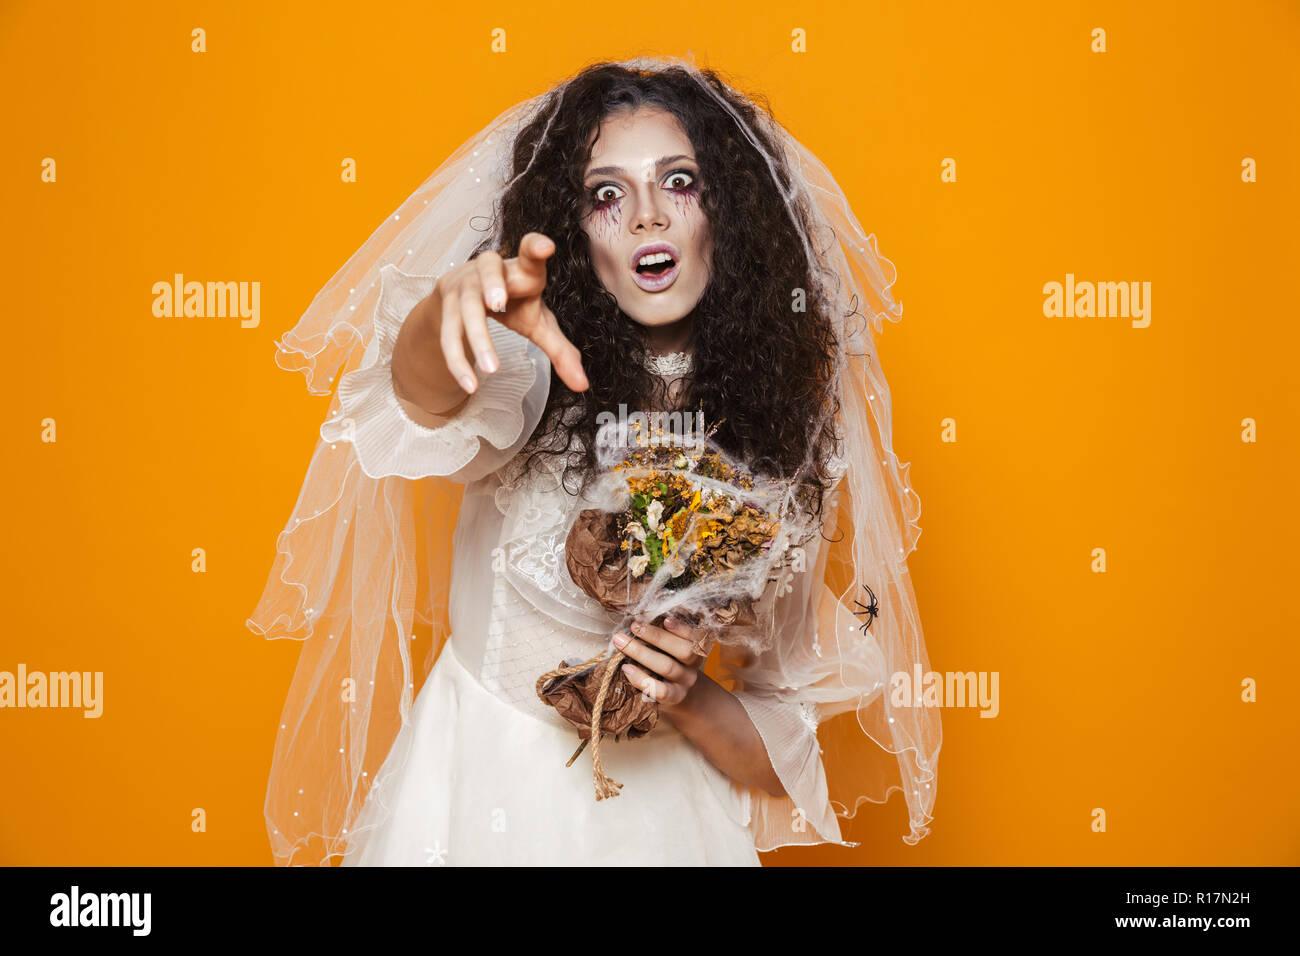 Halloween Looks With Everyday Makeup.Image Of Creepy Bride Zombie On Halloween Wearing Wedding